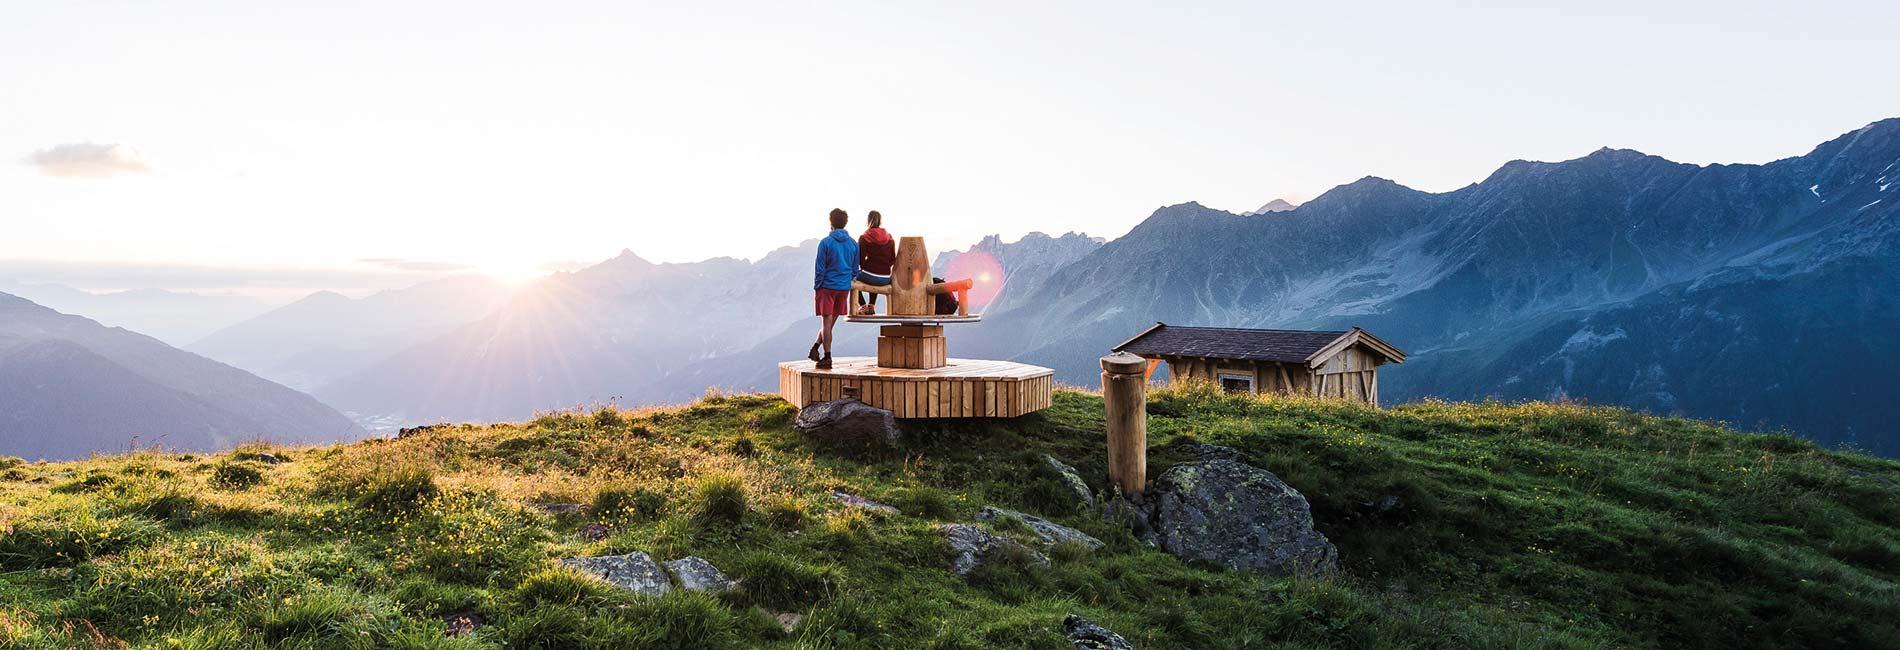 Almrosenpauschale Hotel Almhof Milders Neustift Stubaital Tirol Austria